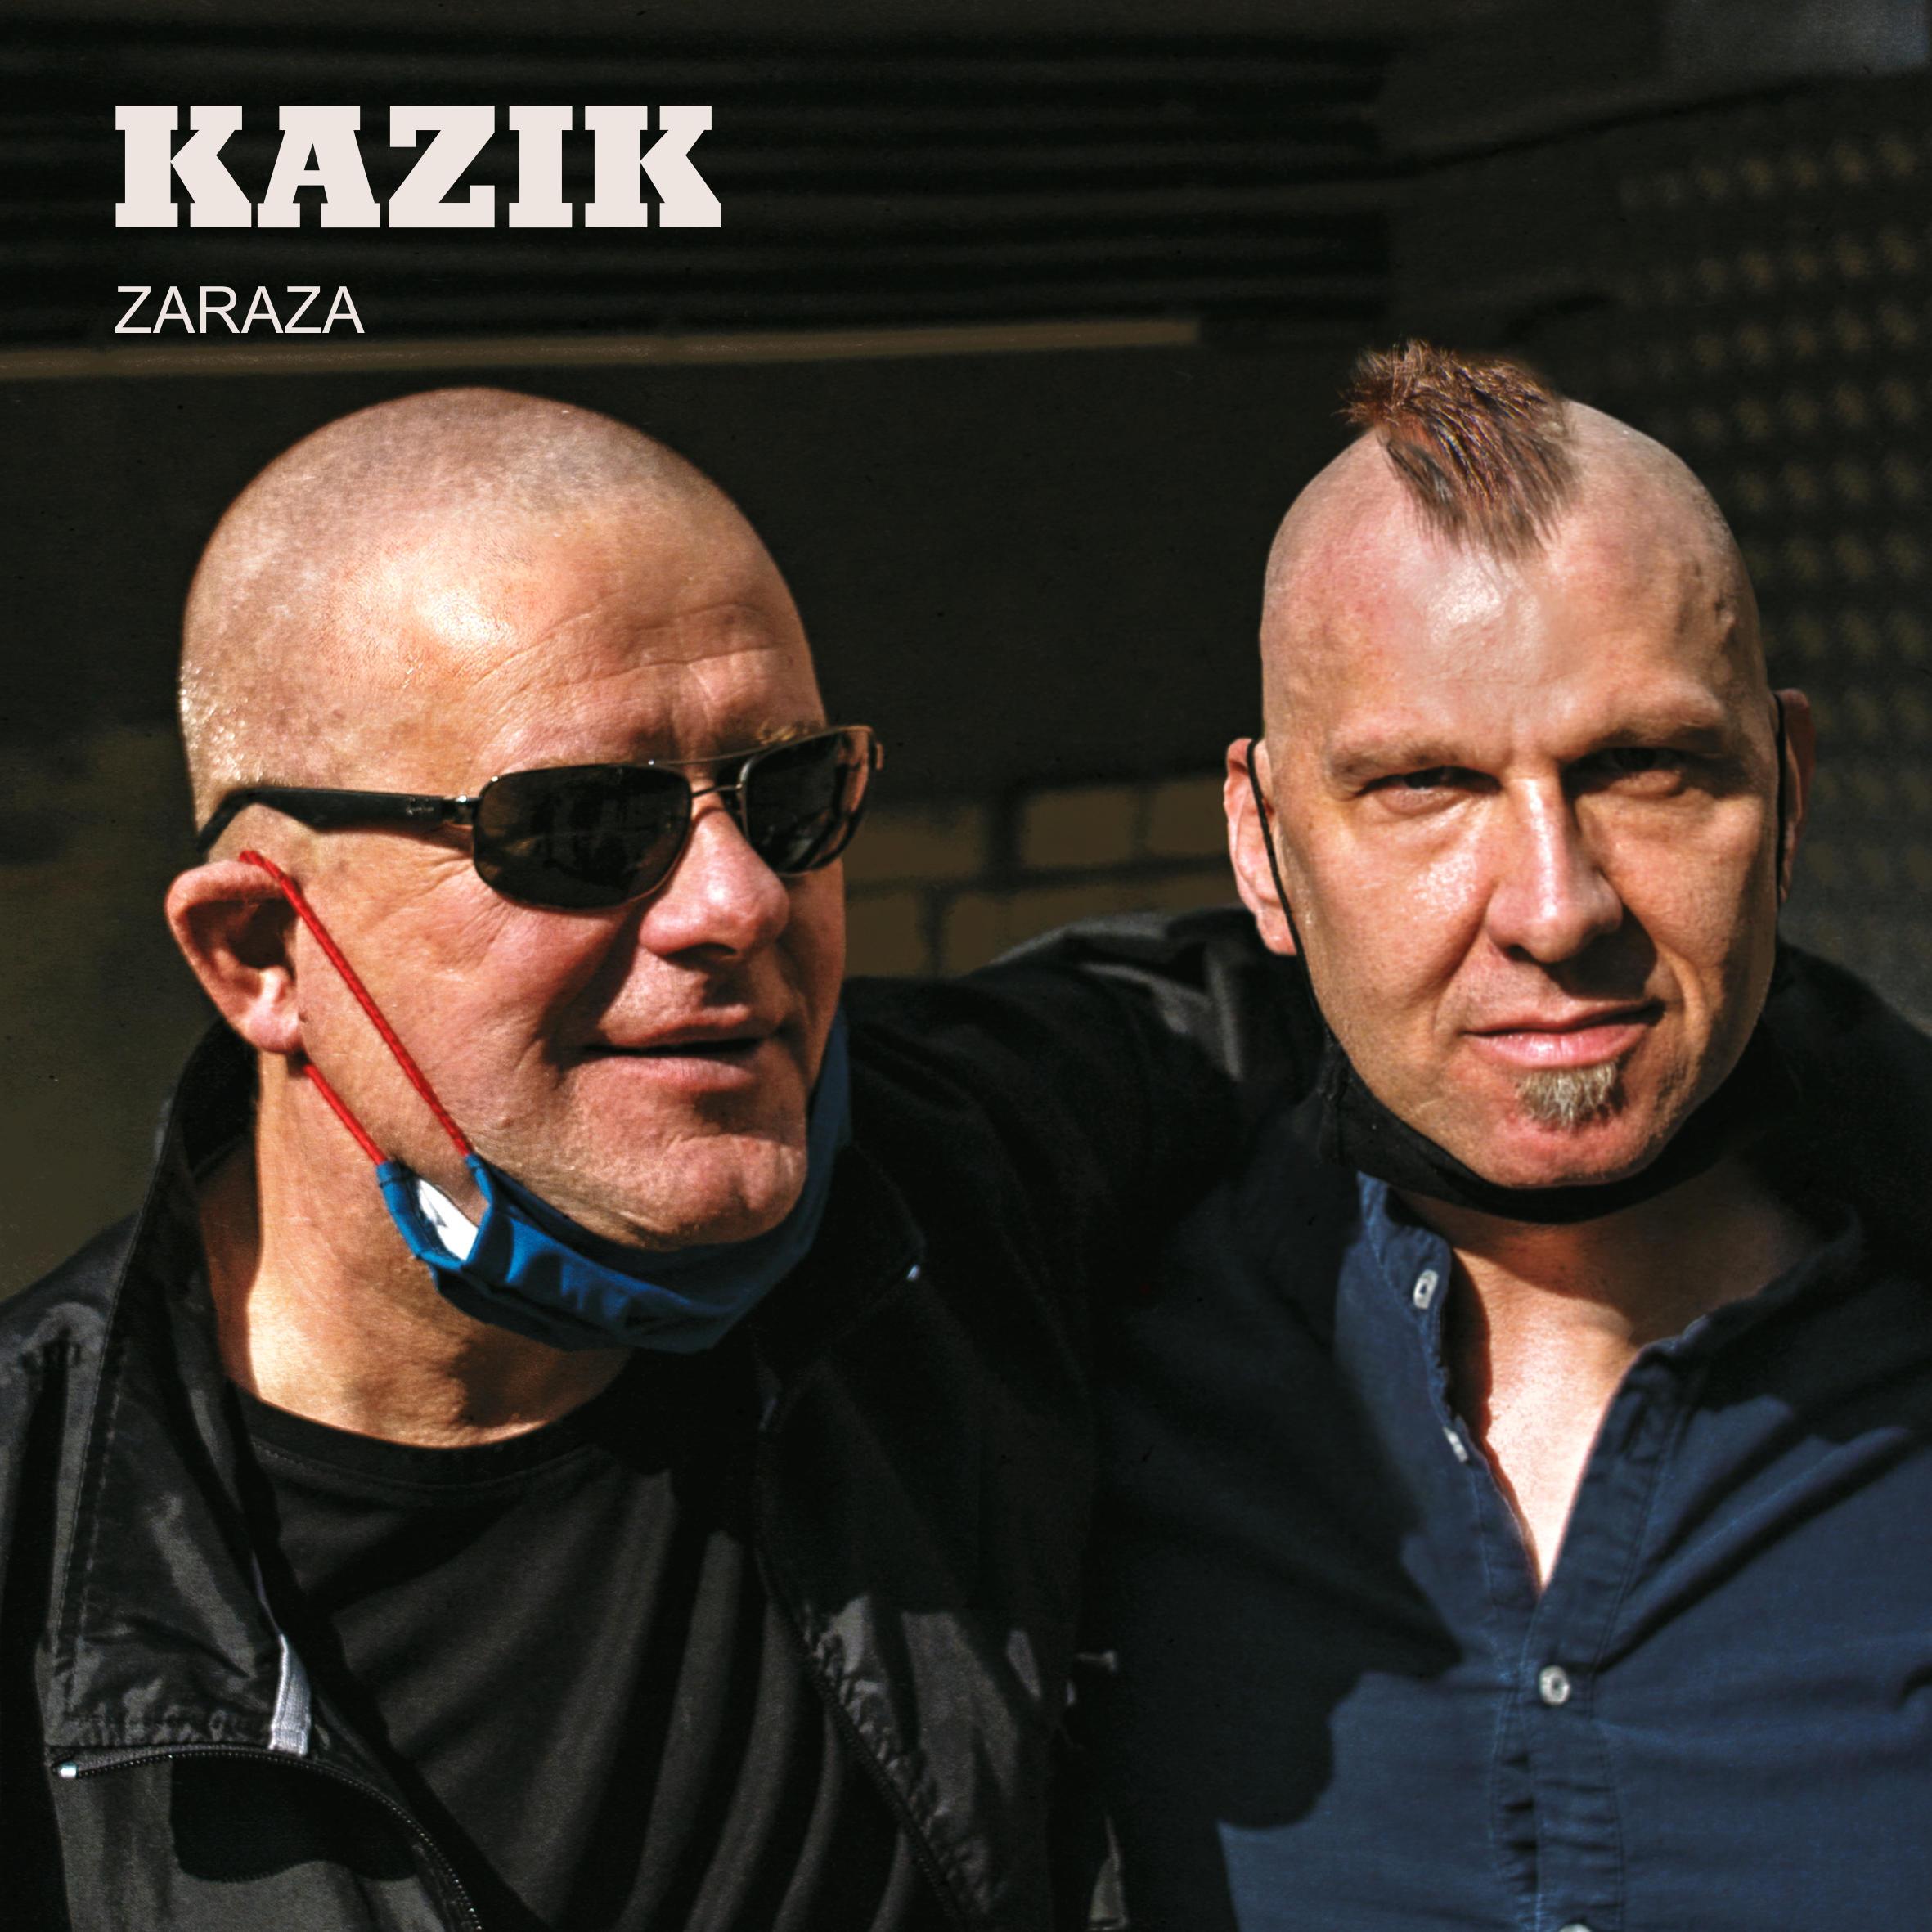 KAZIK ZARAZA